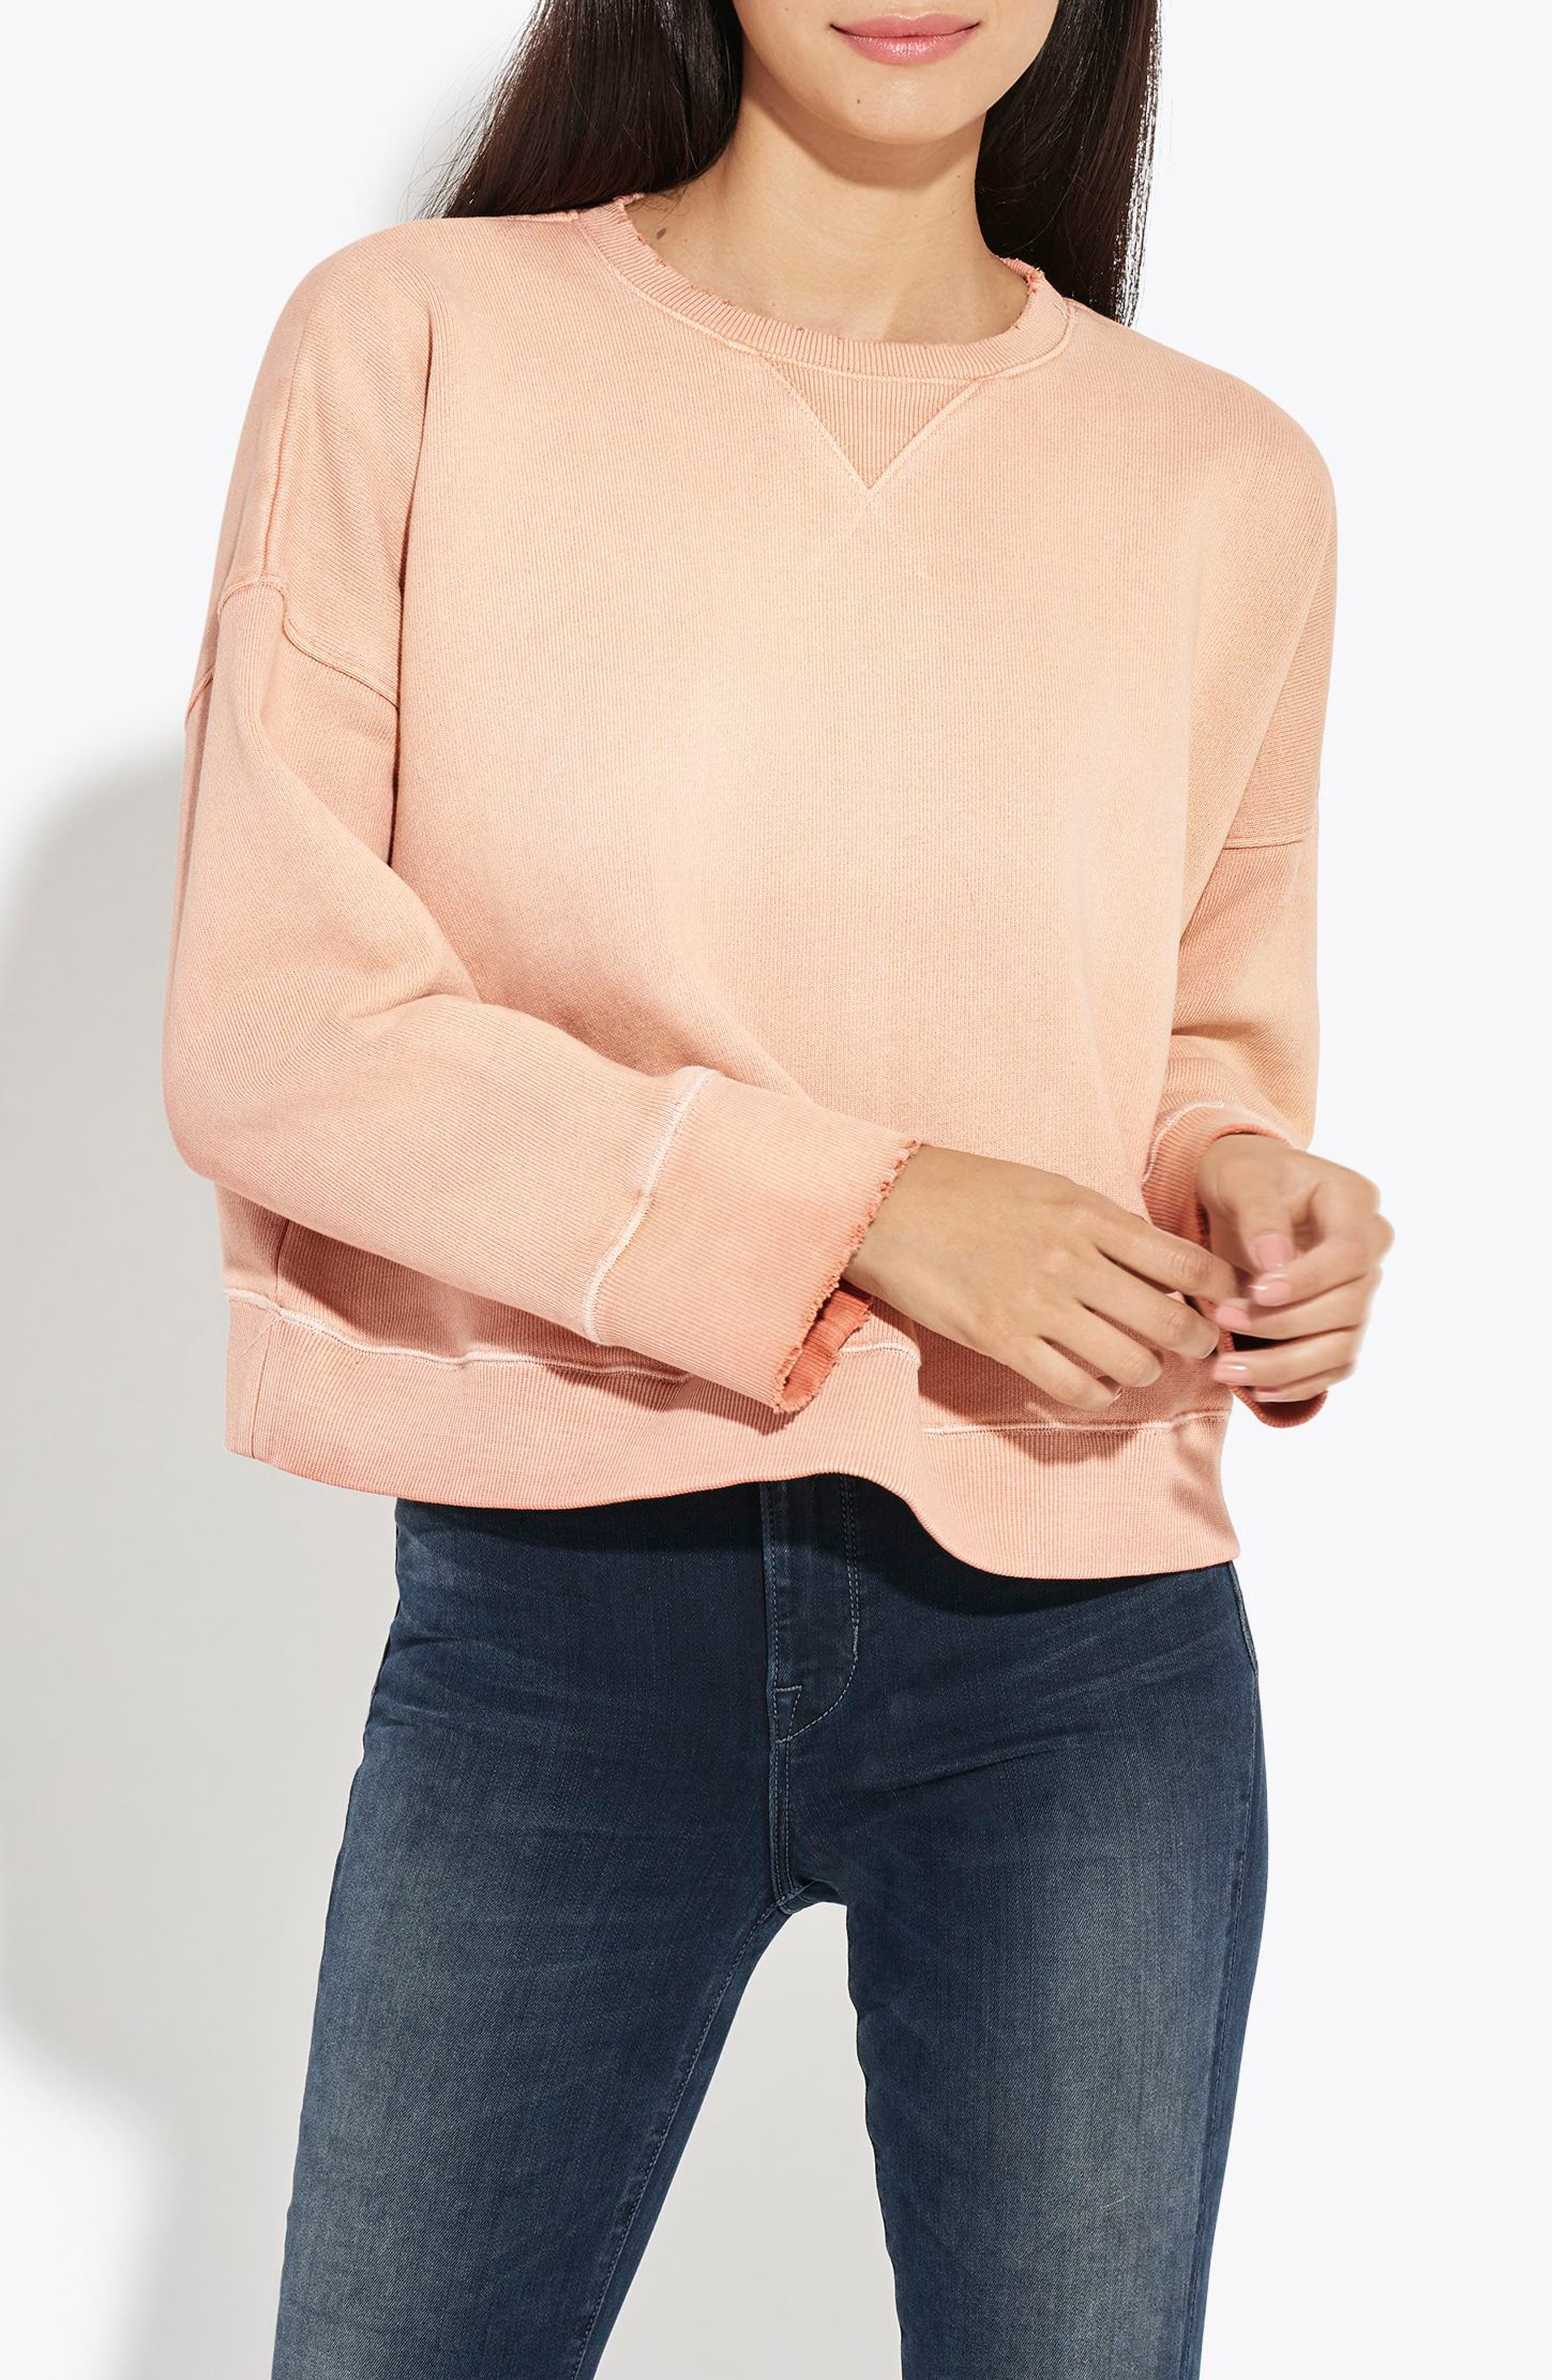 The Big Guy Sweatshirt,                         Main,                         color, 800